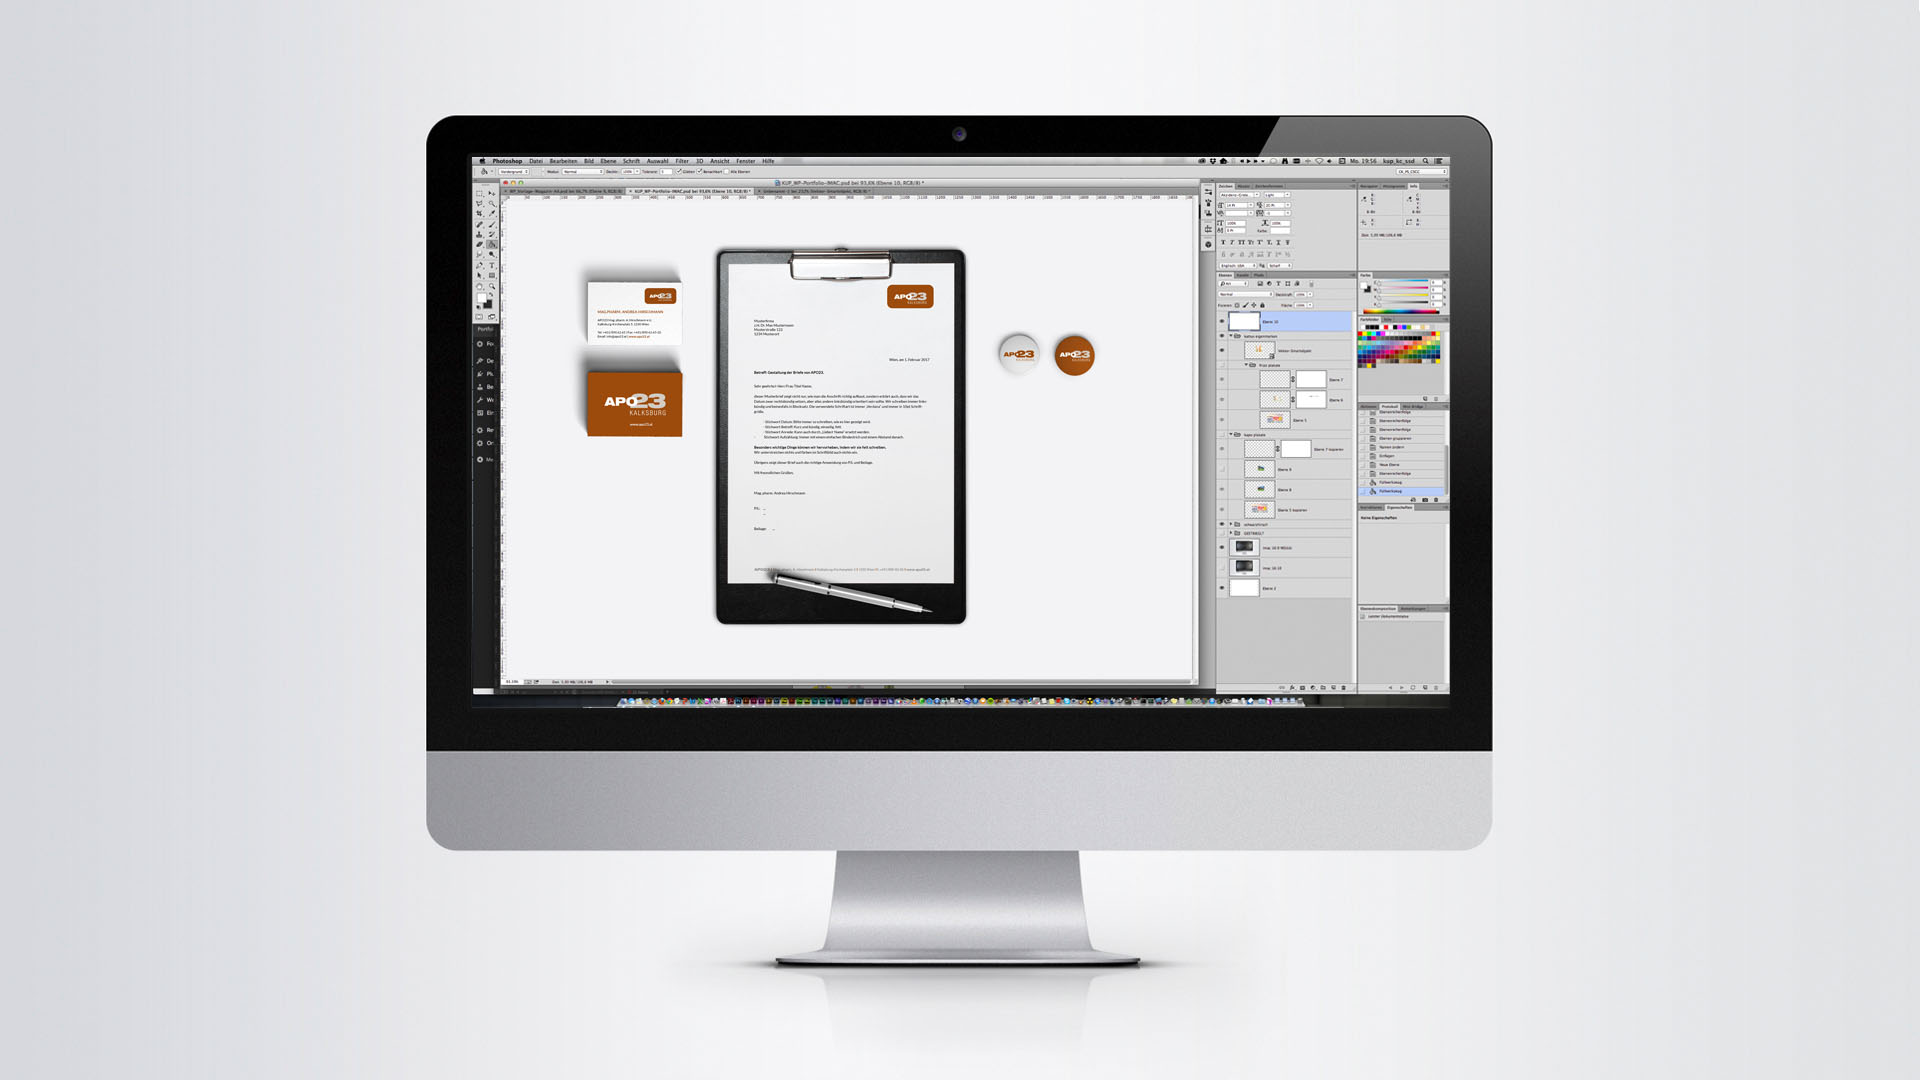 Corporate Design APO23